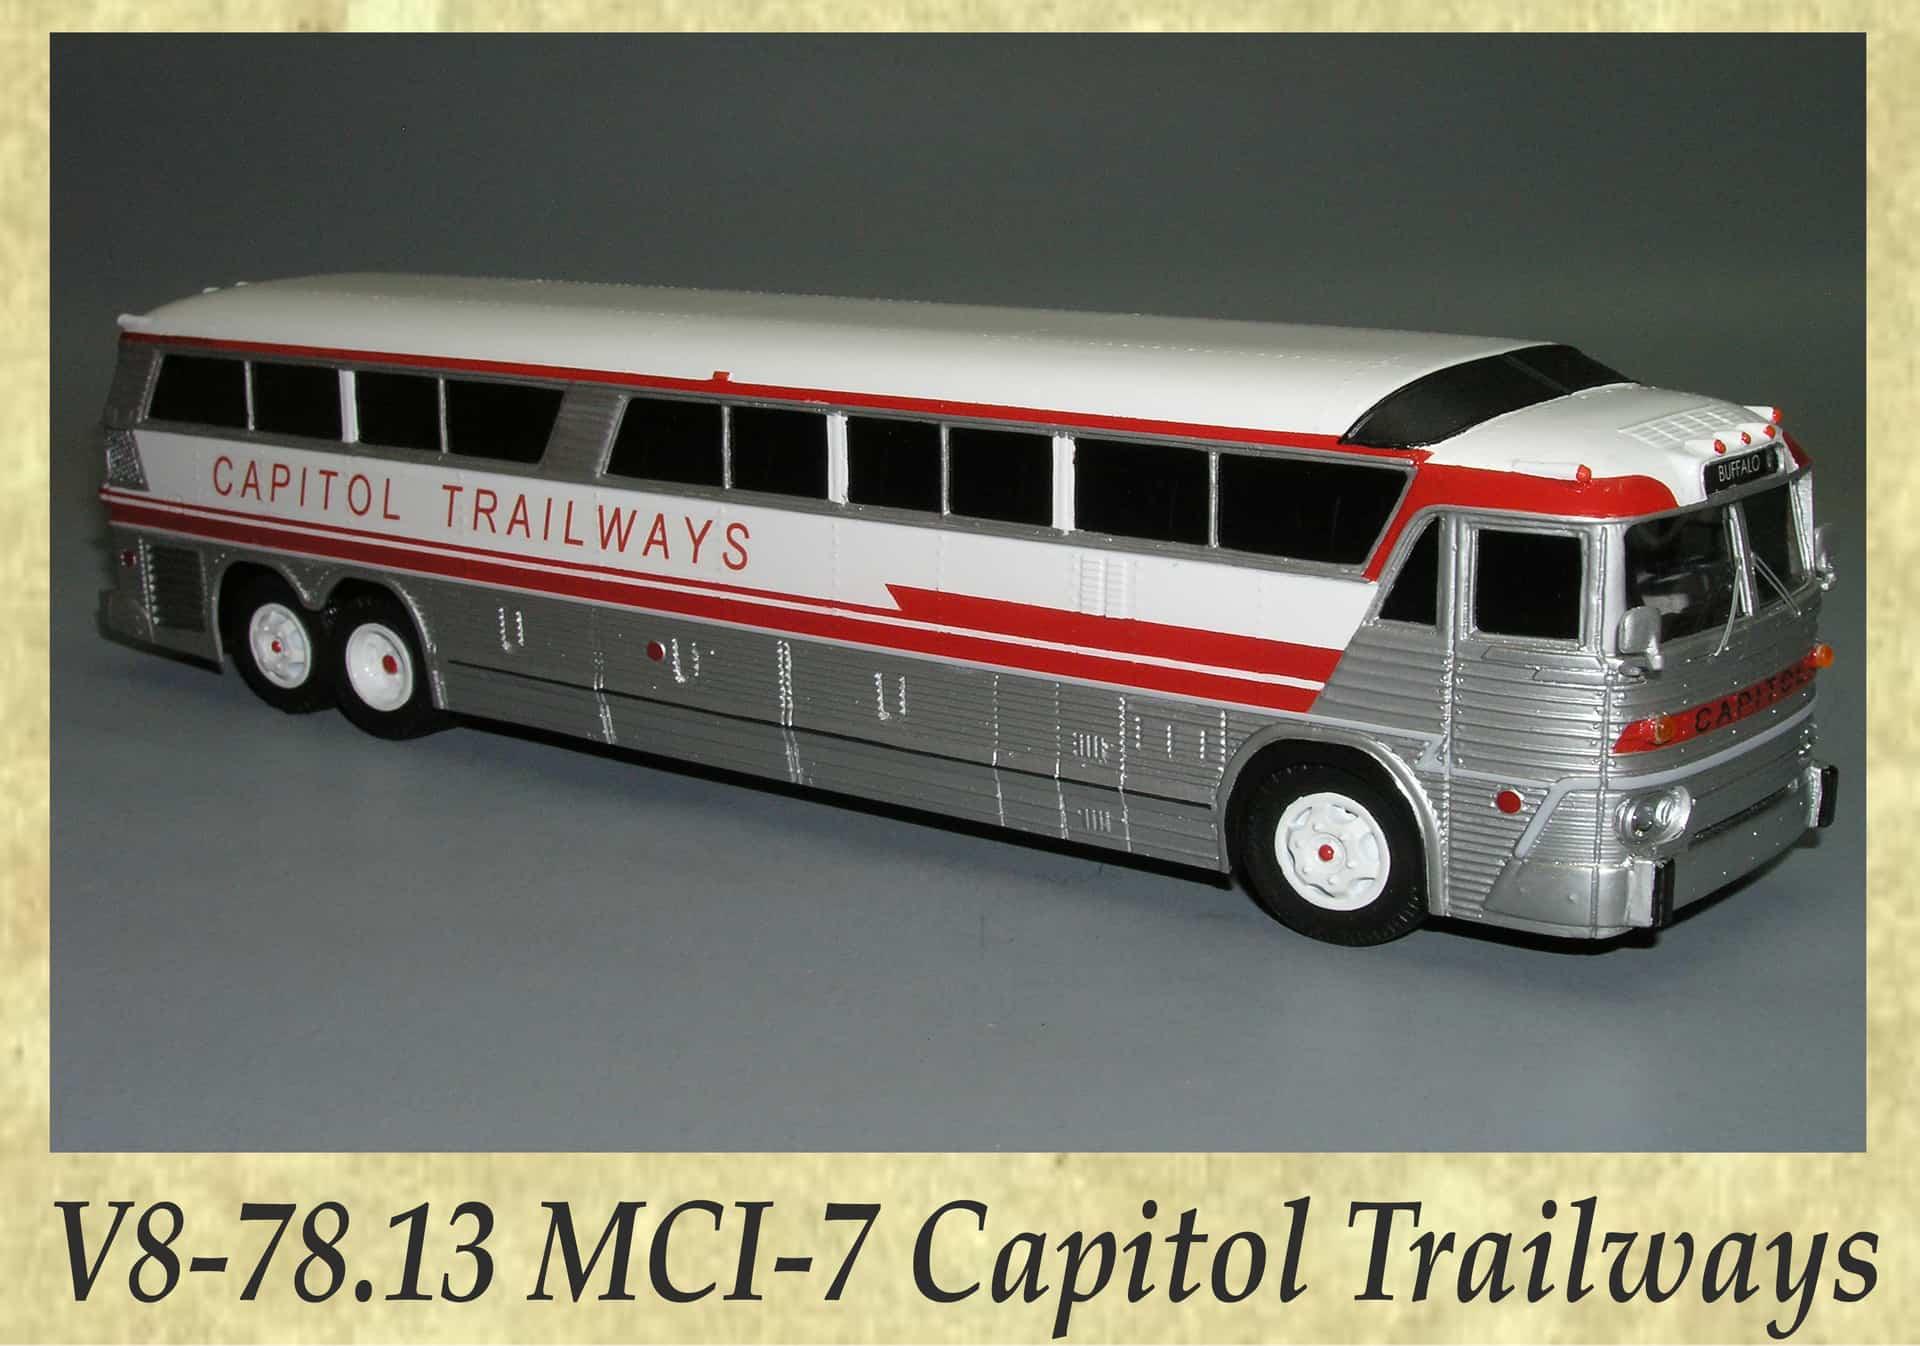 V8-78.13 MCI-7 Capitol Trailways